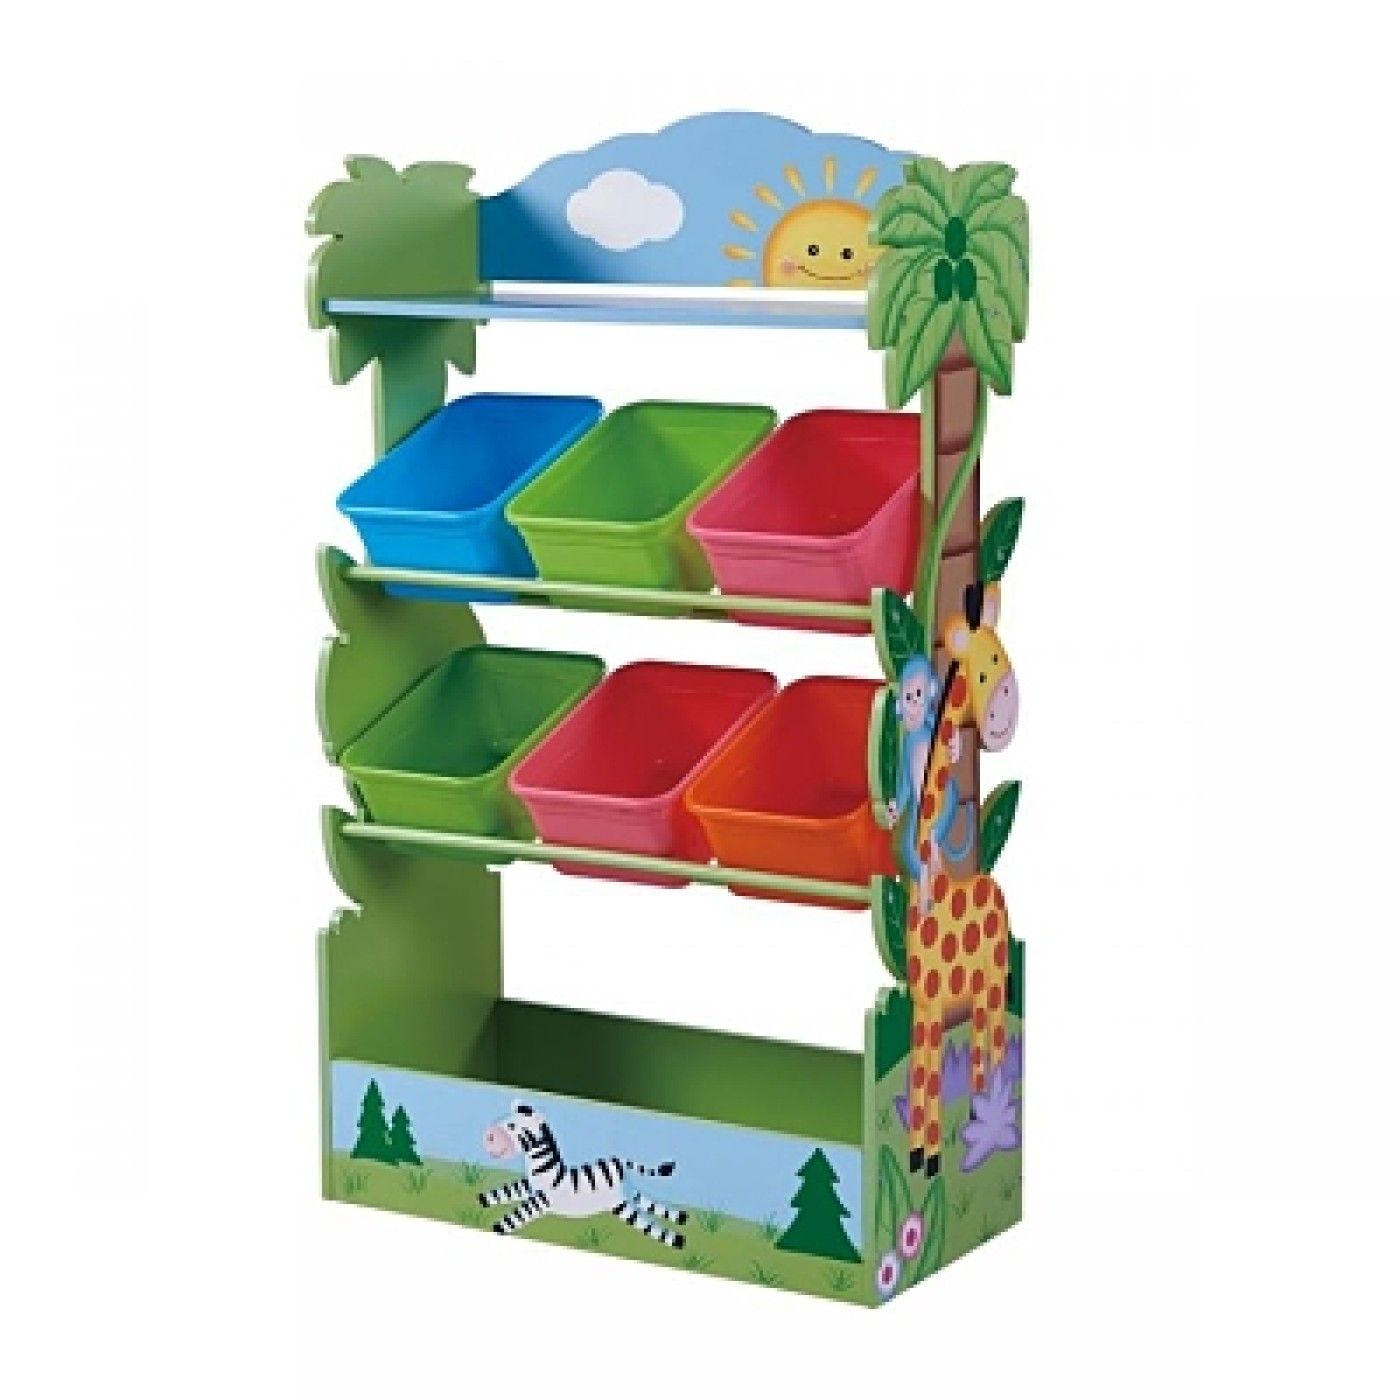 Sunny Safari Toy Organizer with Bins